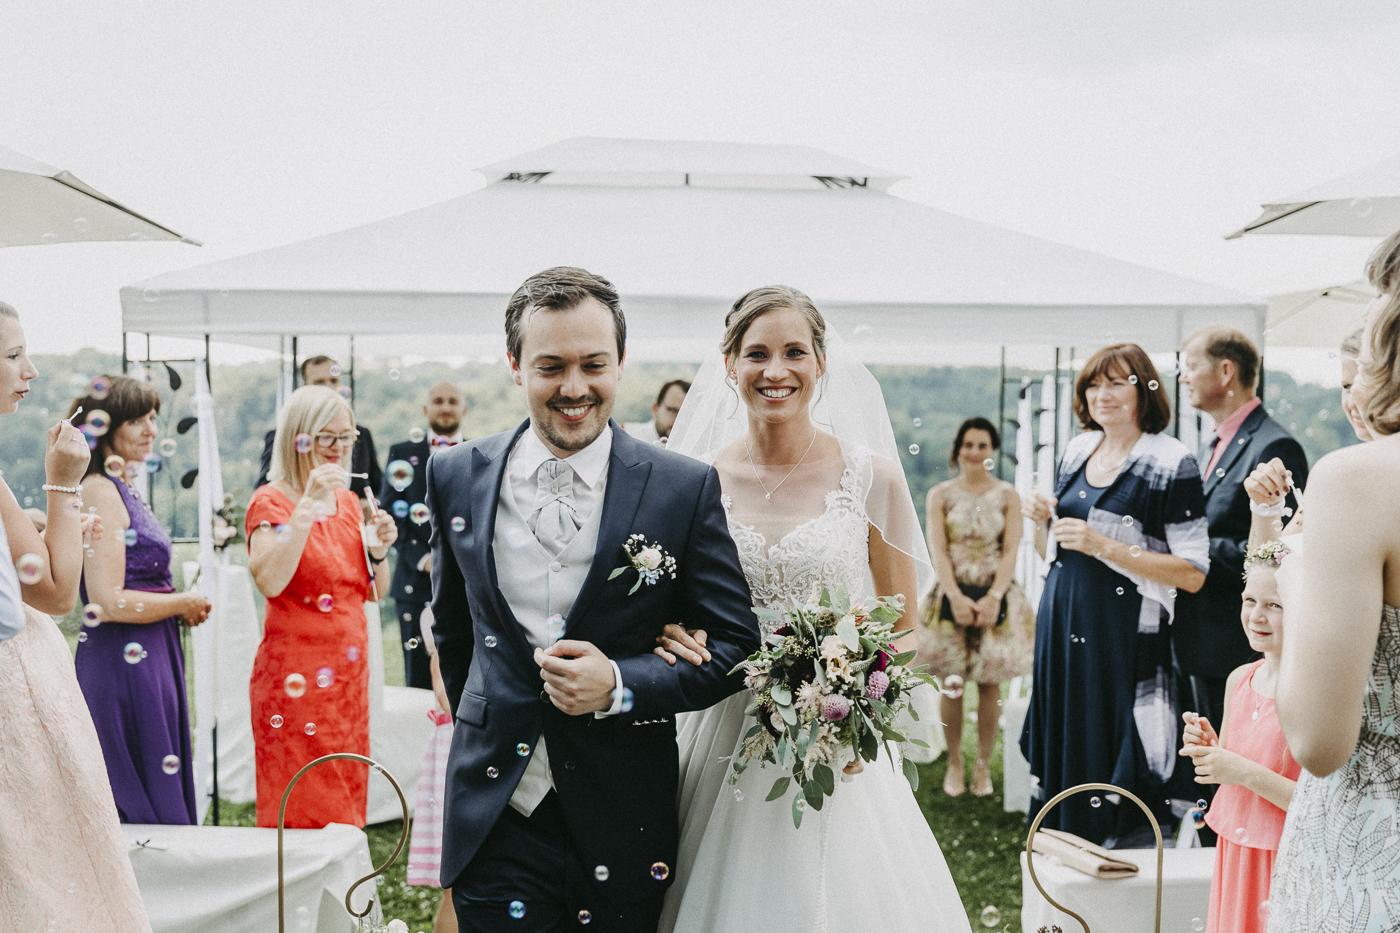 rosemarrylemon_ND_Hochzeit_Hochzeitsplanung2.jpg